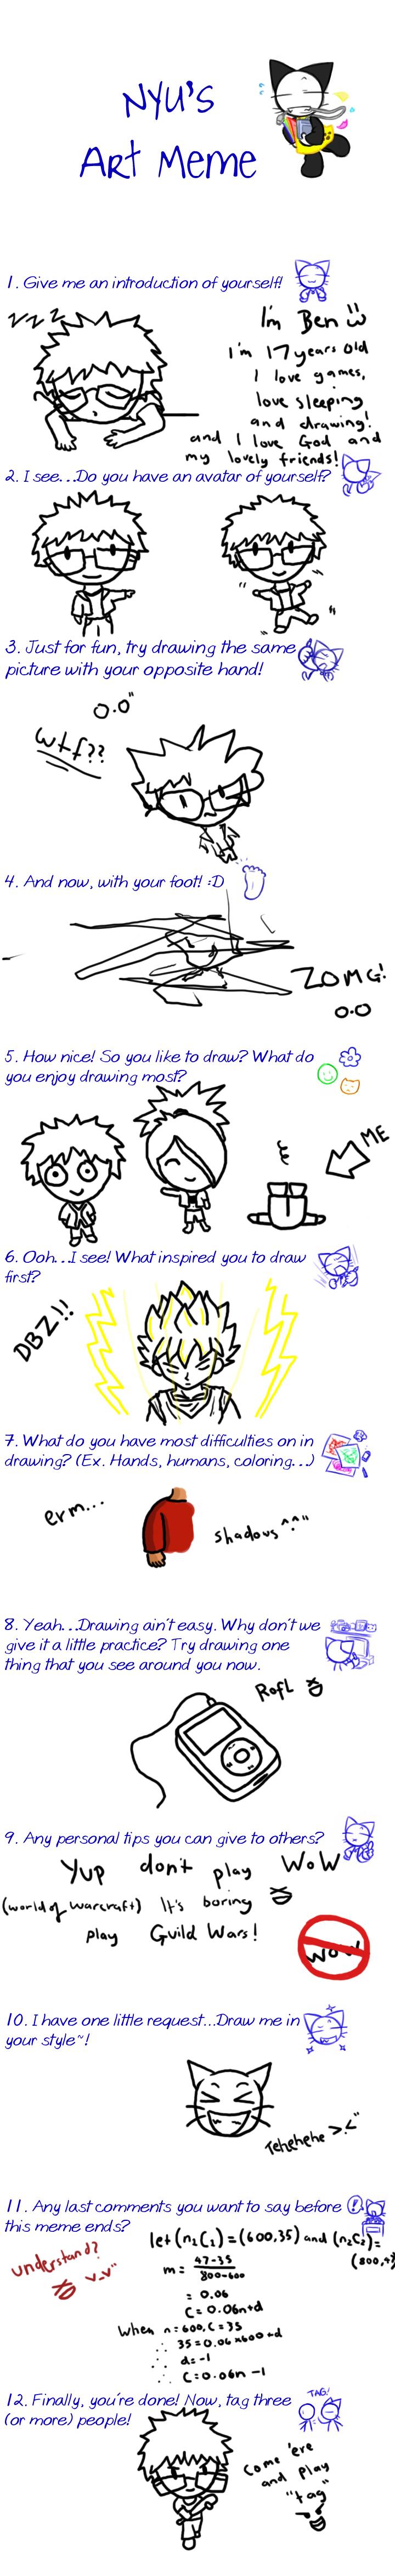 MY art meme by TheBlueFruit